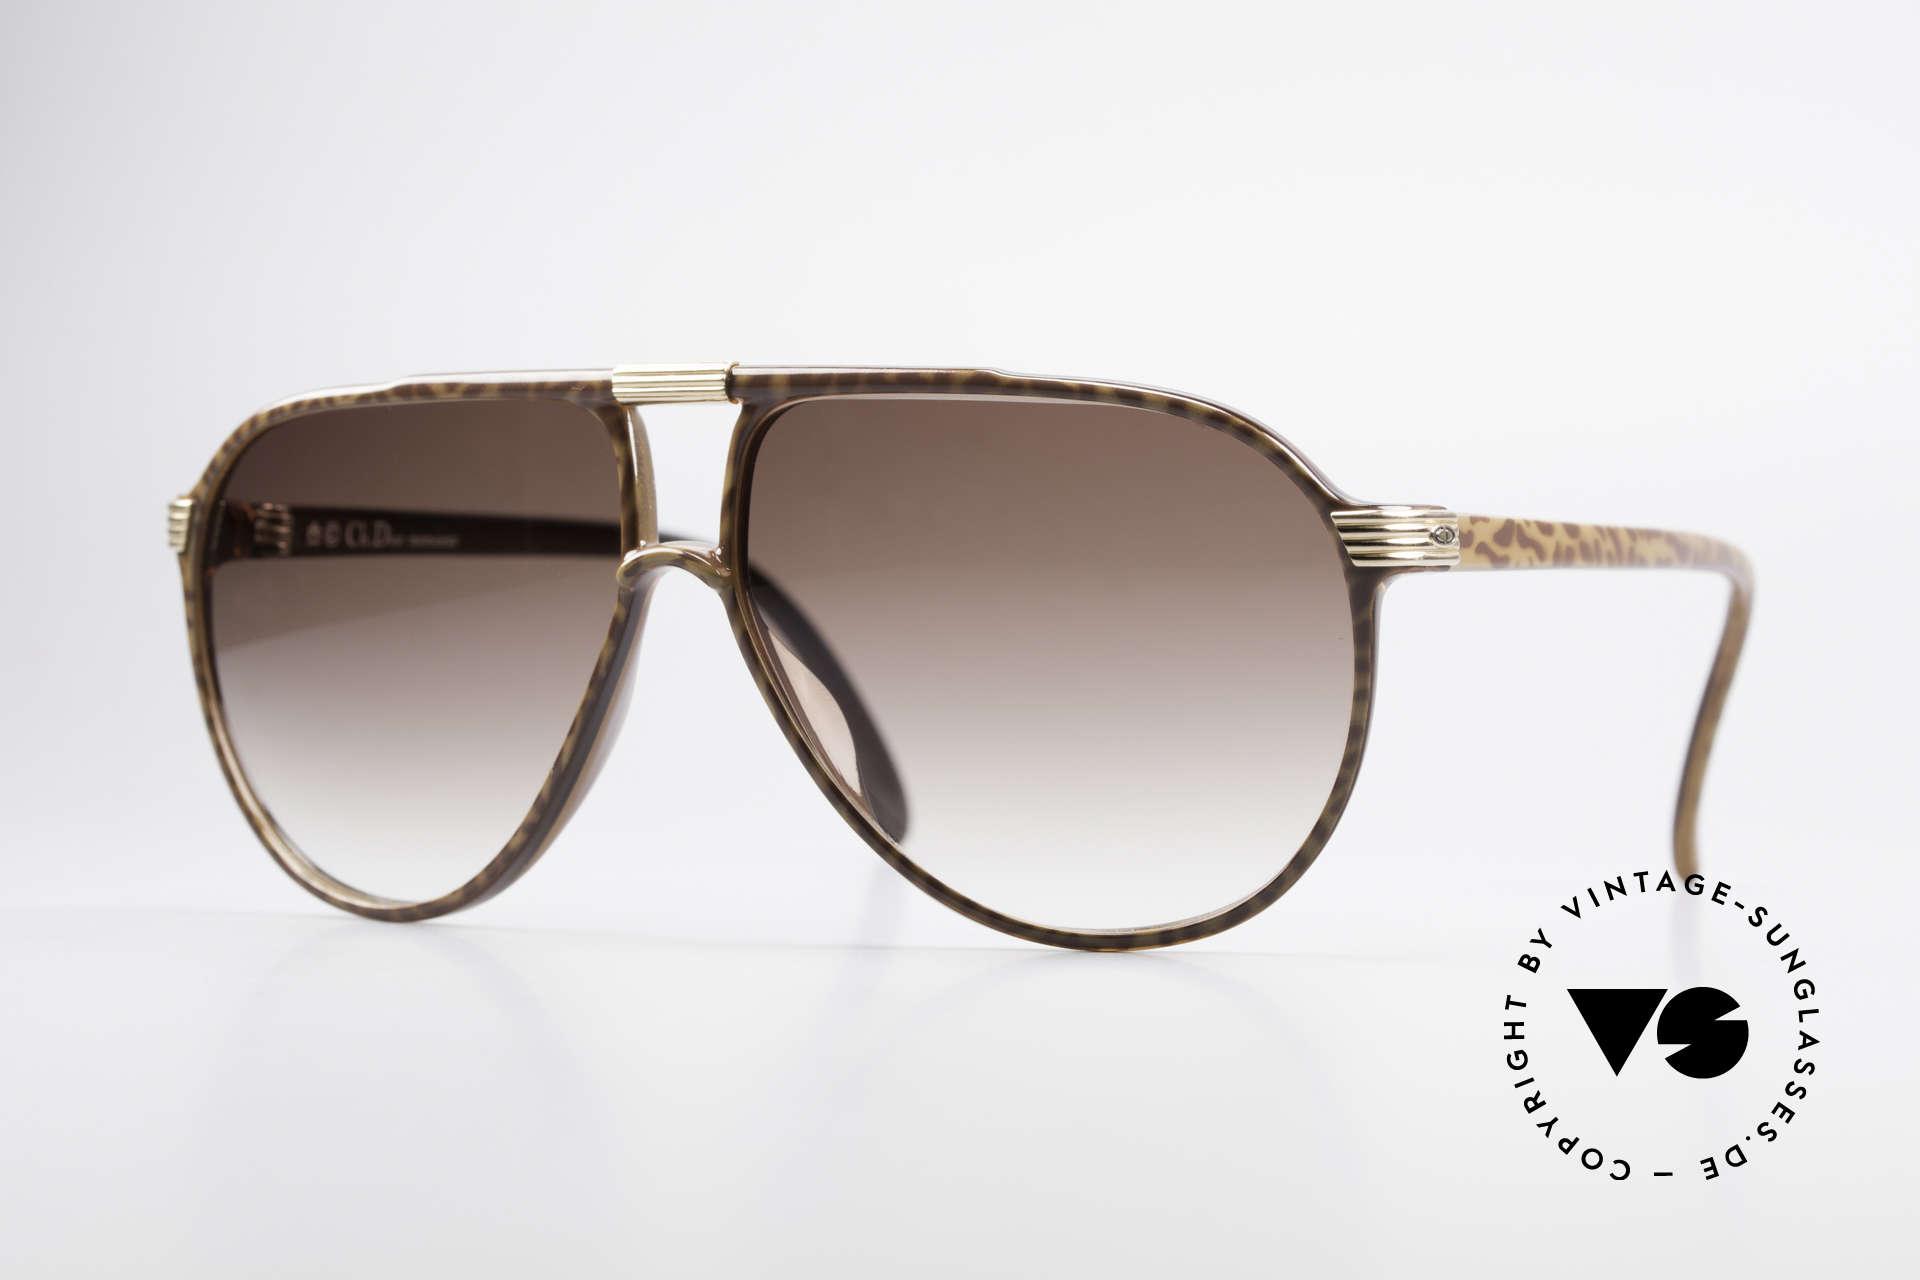 Christian Dior 2300 80's Aviator Sunglasses, orig. Christian Dior vintage sunglasses from 1985, Made for Men